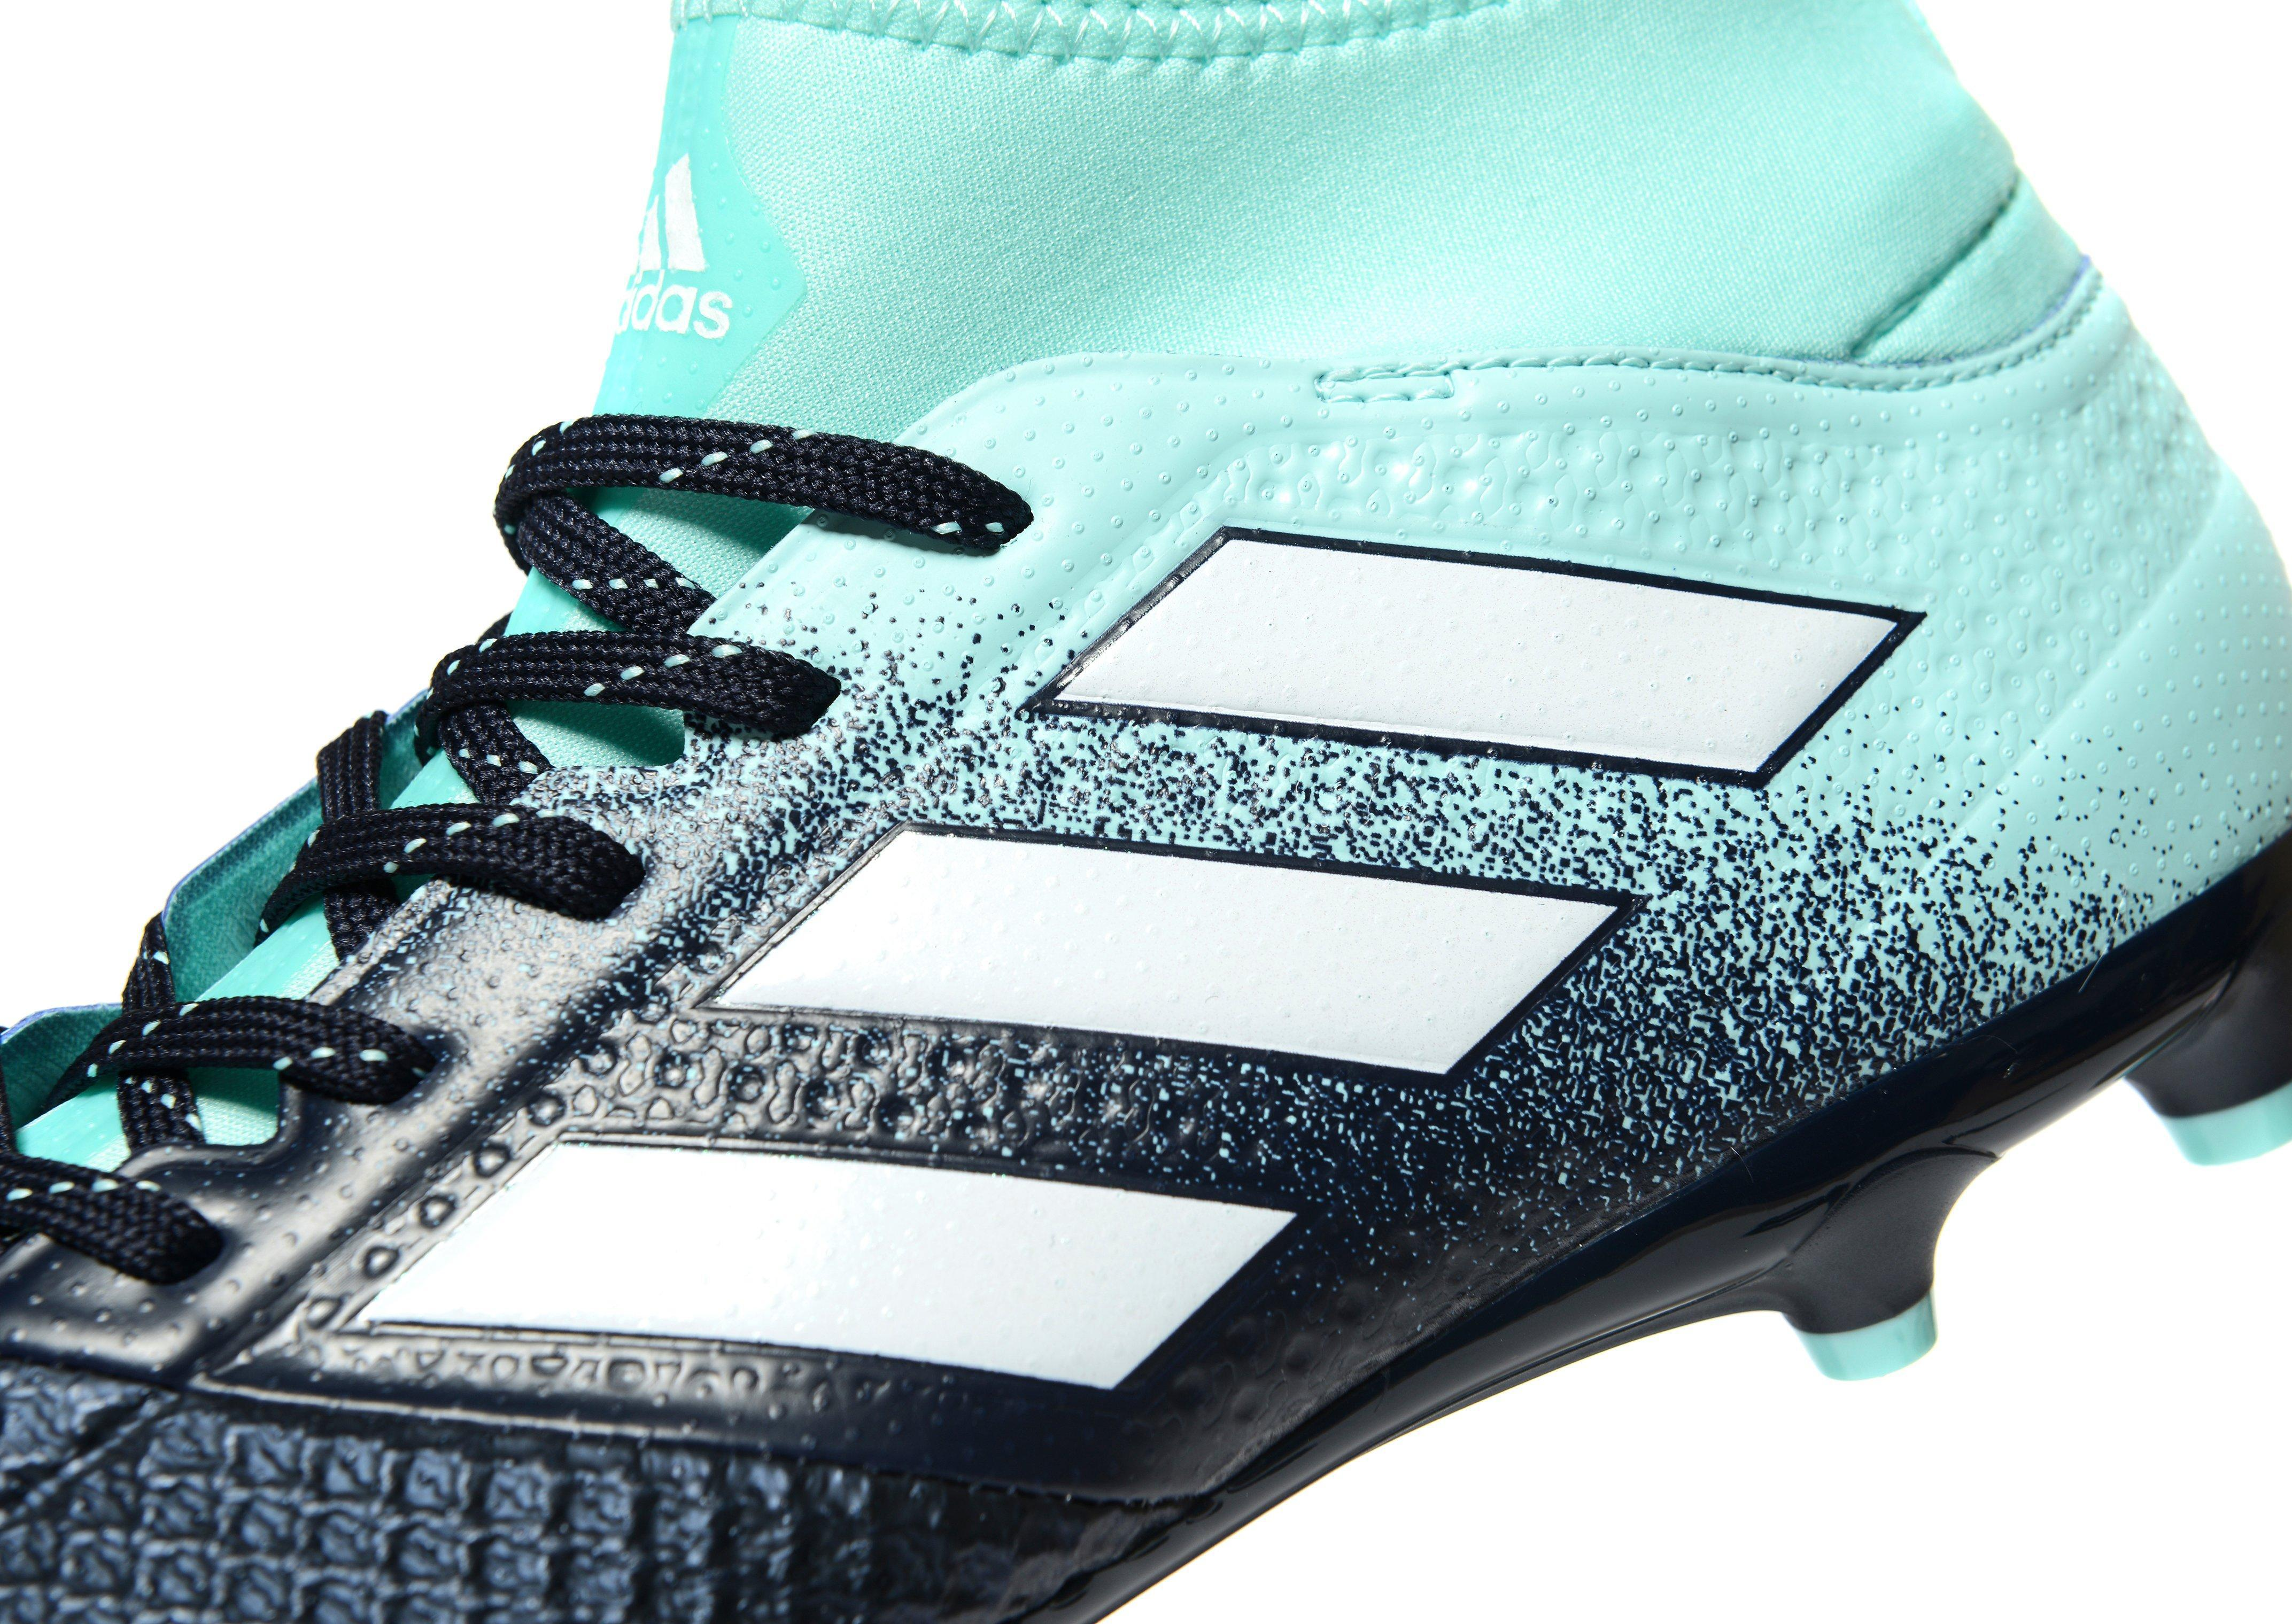 adidas Synthetic Ocean Storm Ace 17.3 Fg in e'aqua (Blue) for Men